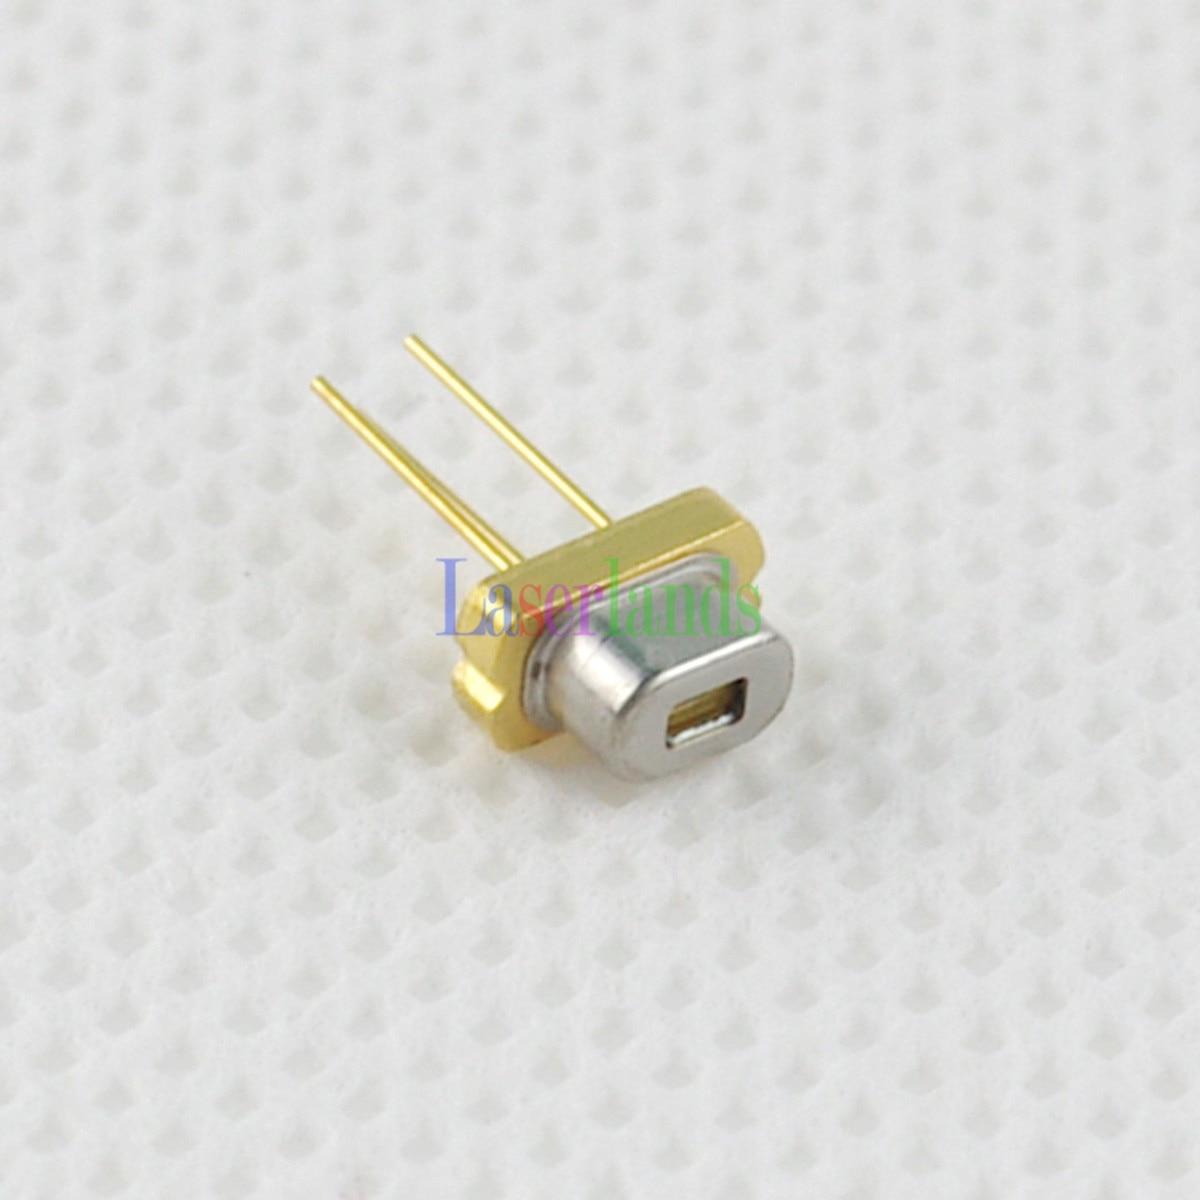 Nichia 405NM Violet/Blue CW 500mw Laser Diode LD Brand New sony 405nm violet blue cw 150mw laser diode ld sld3236vf to18 5 6mm